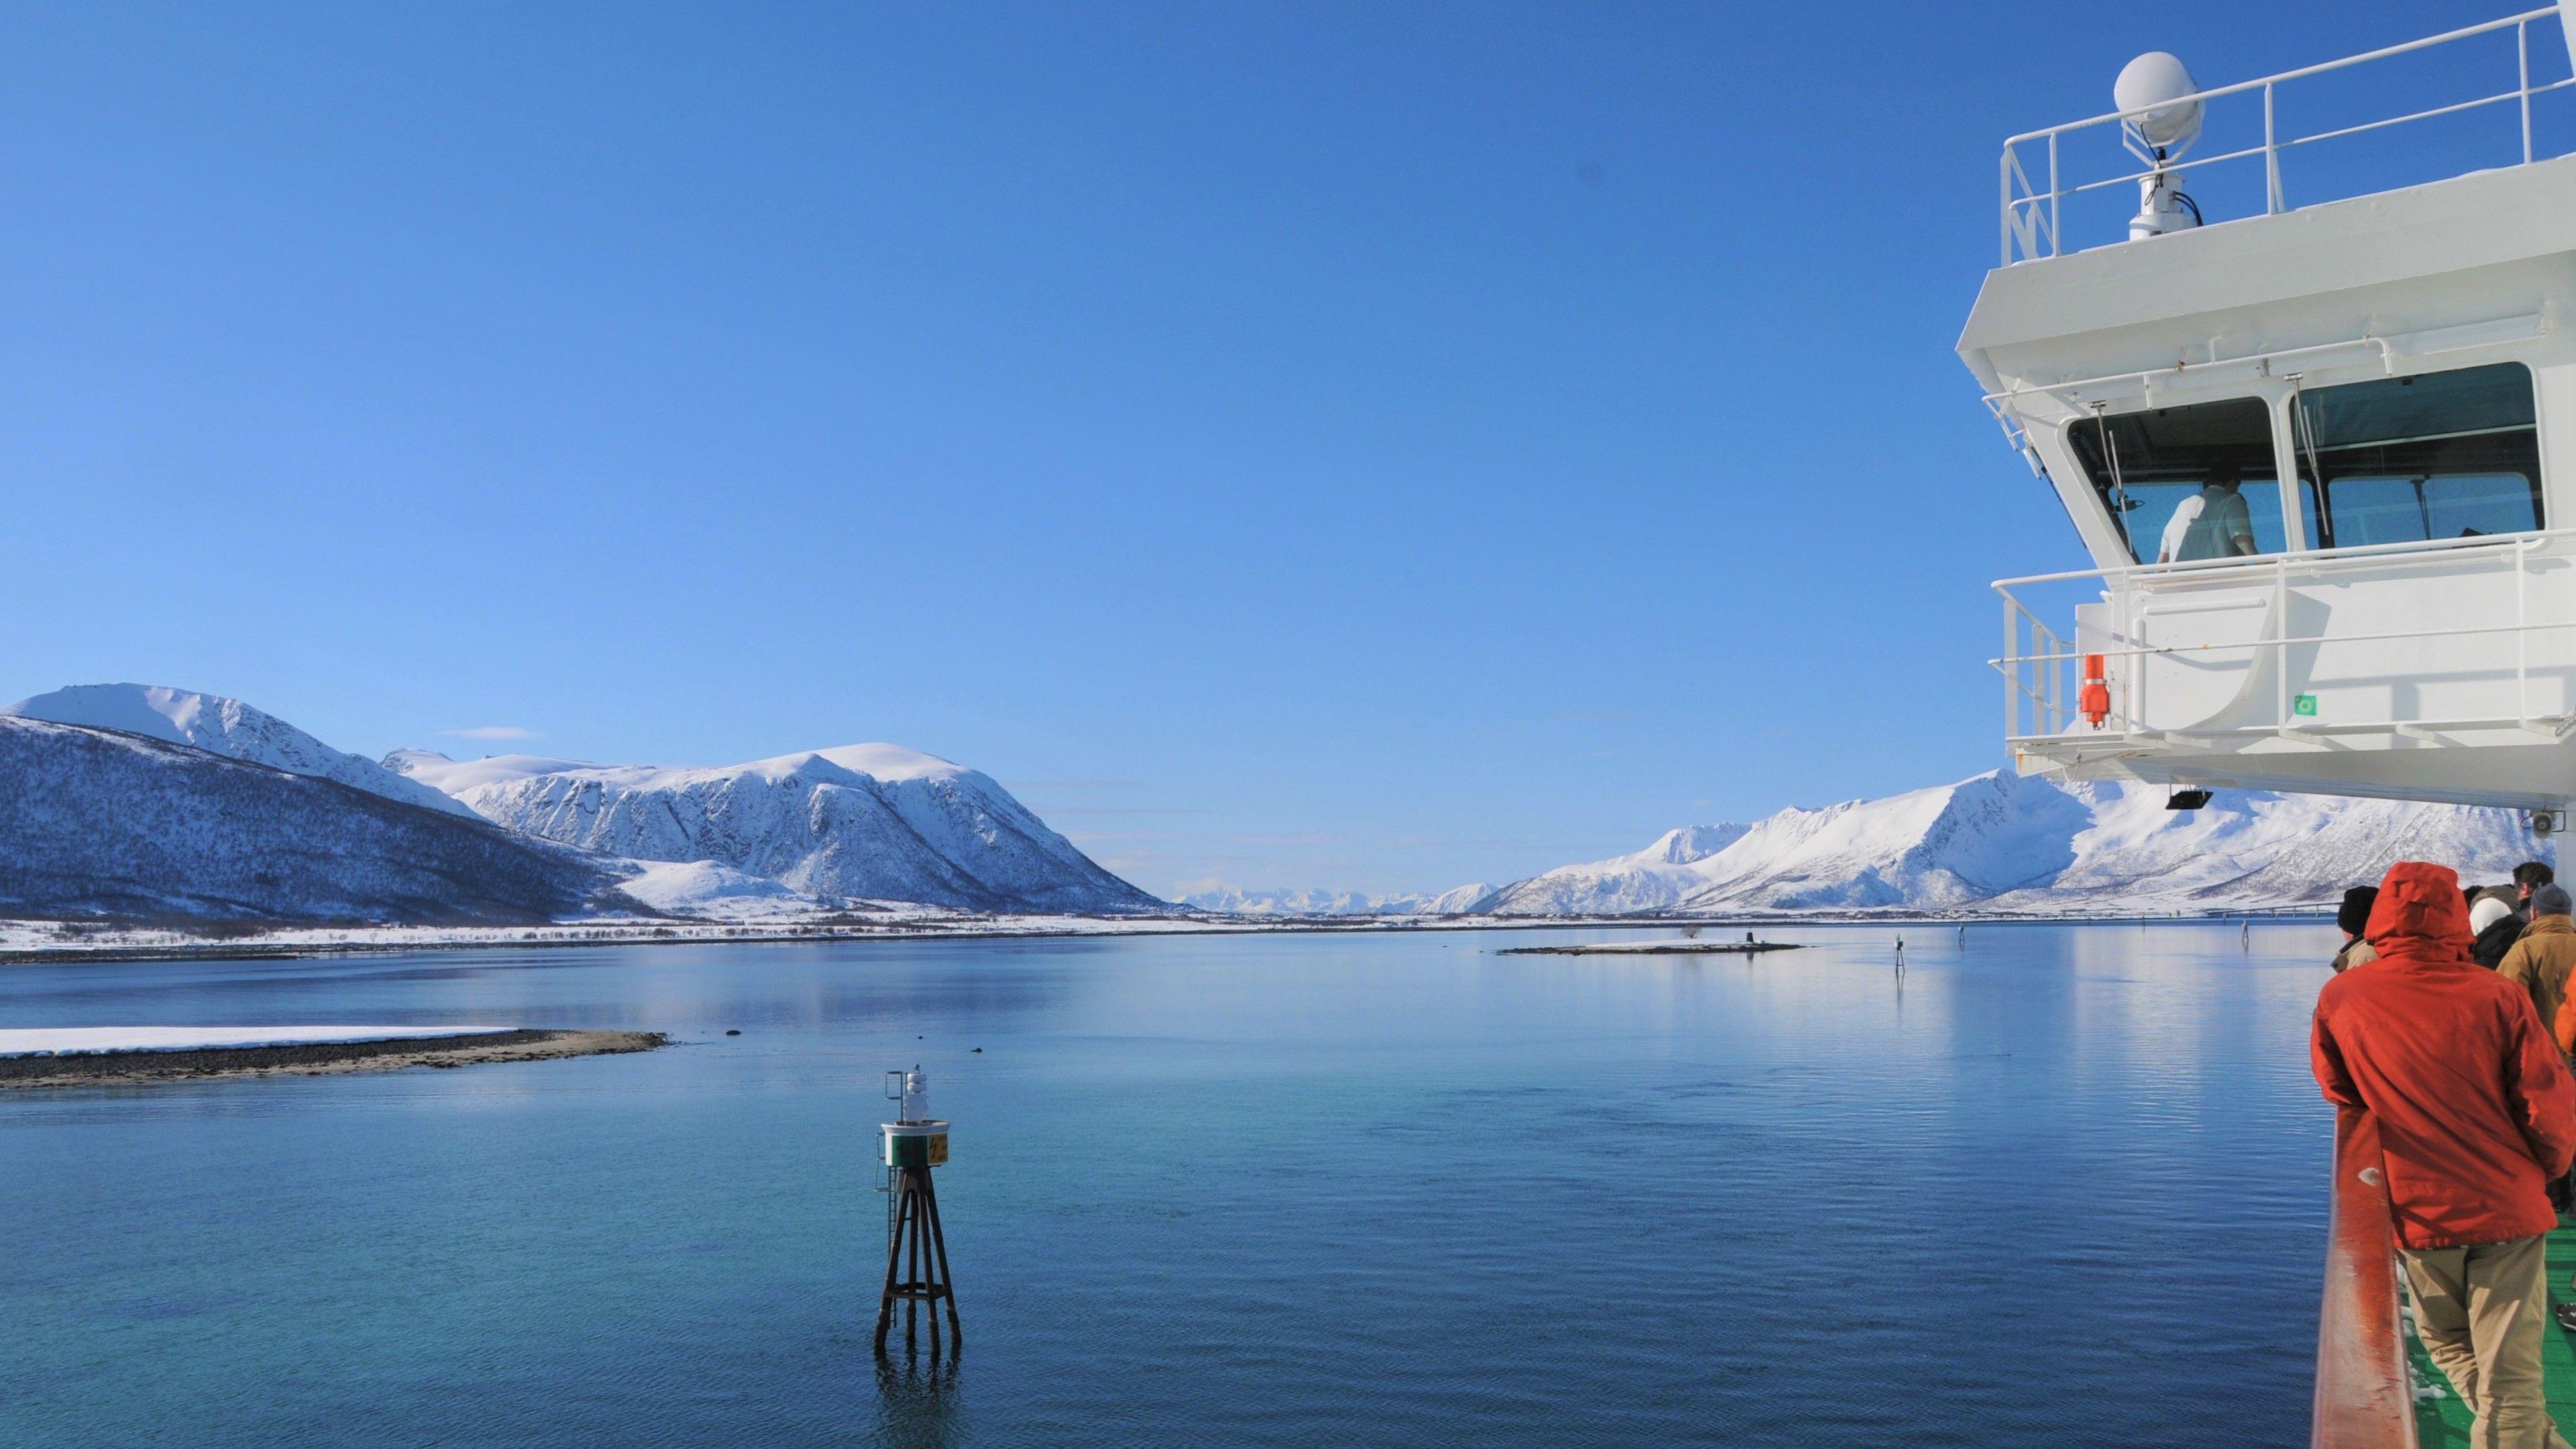 Hurtigrutenschiff im Winter